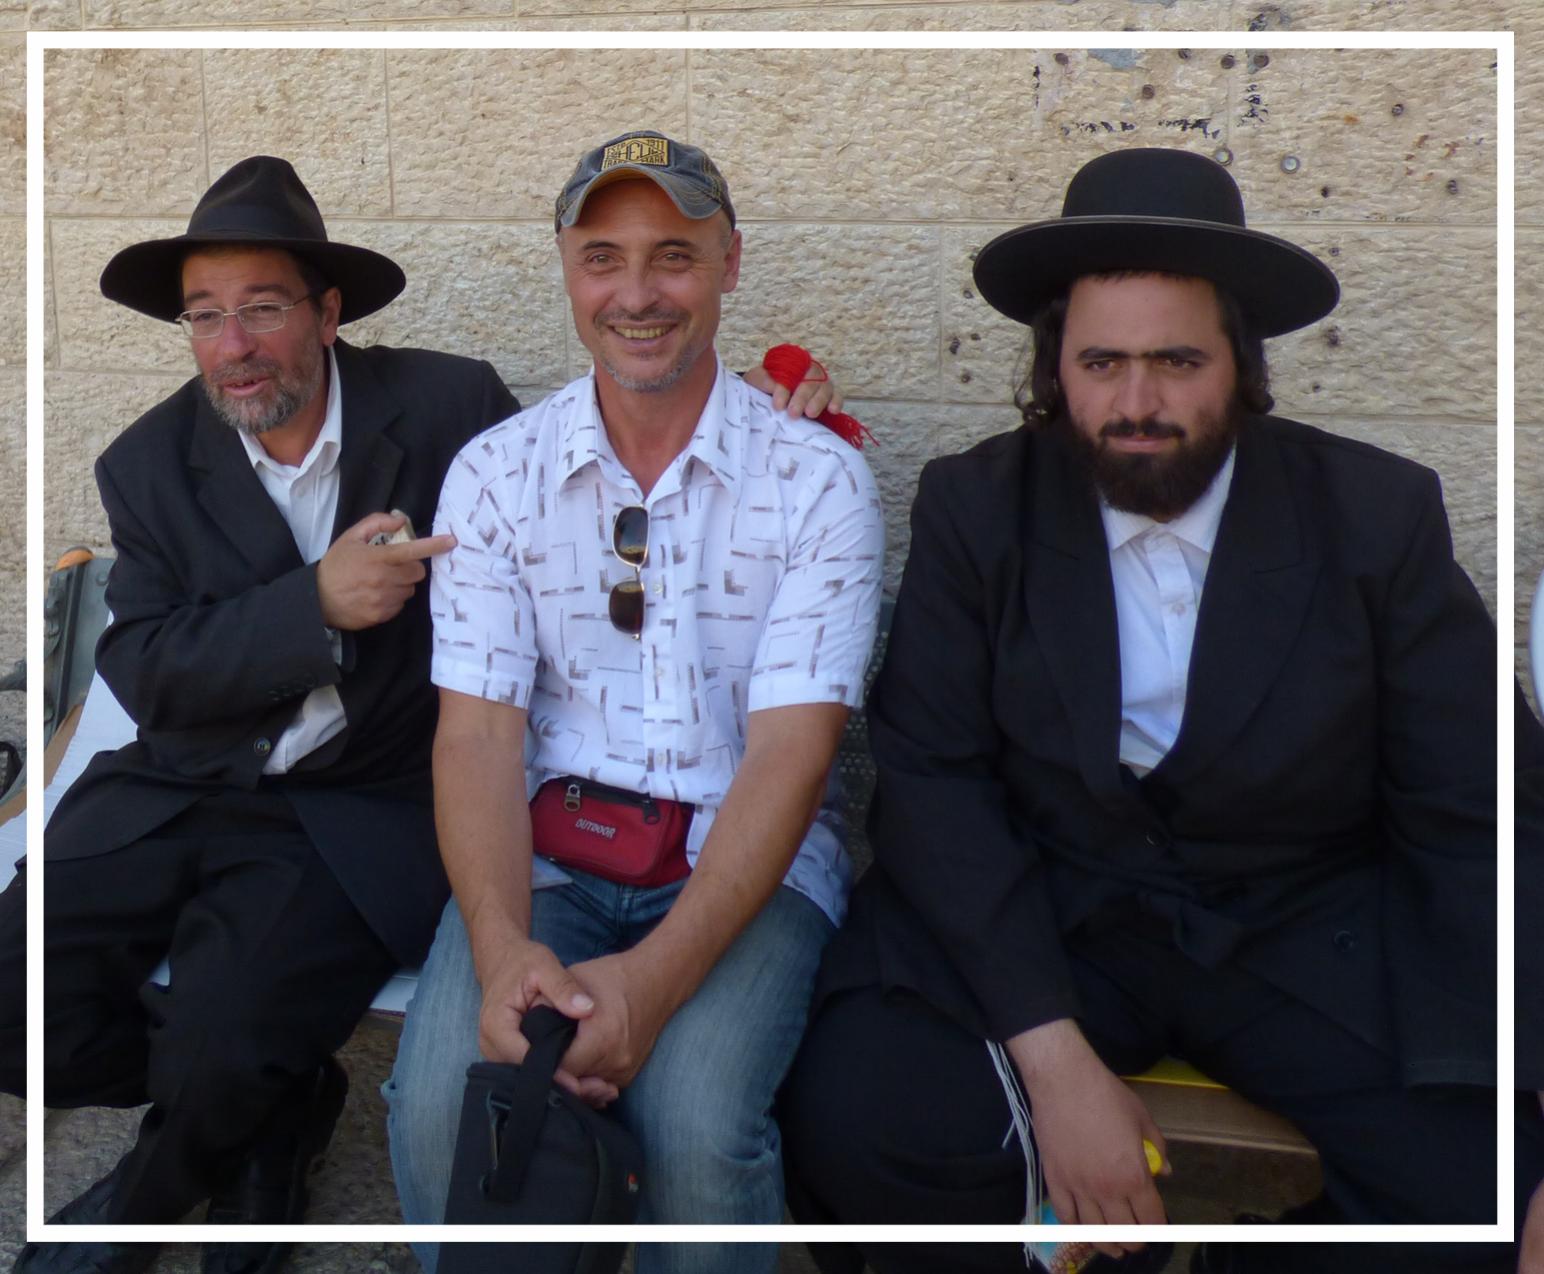 With the Orthodox Jews